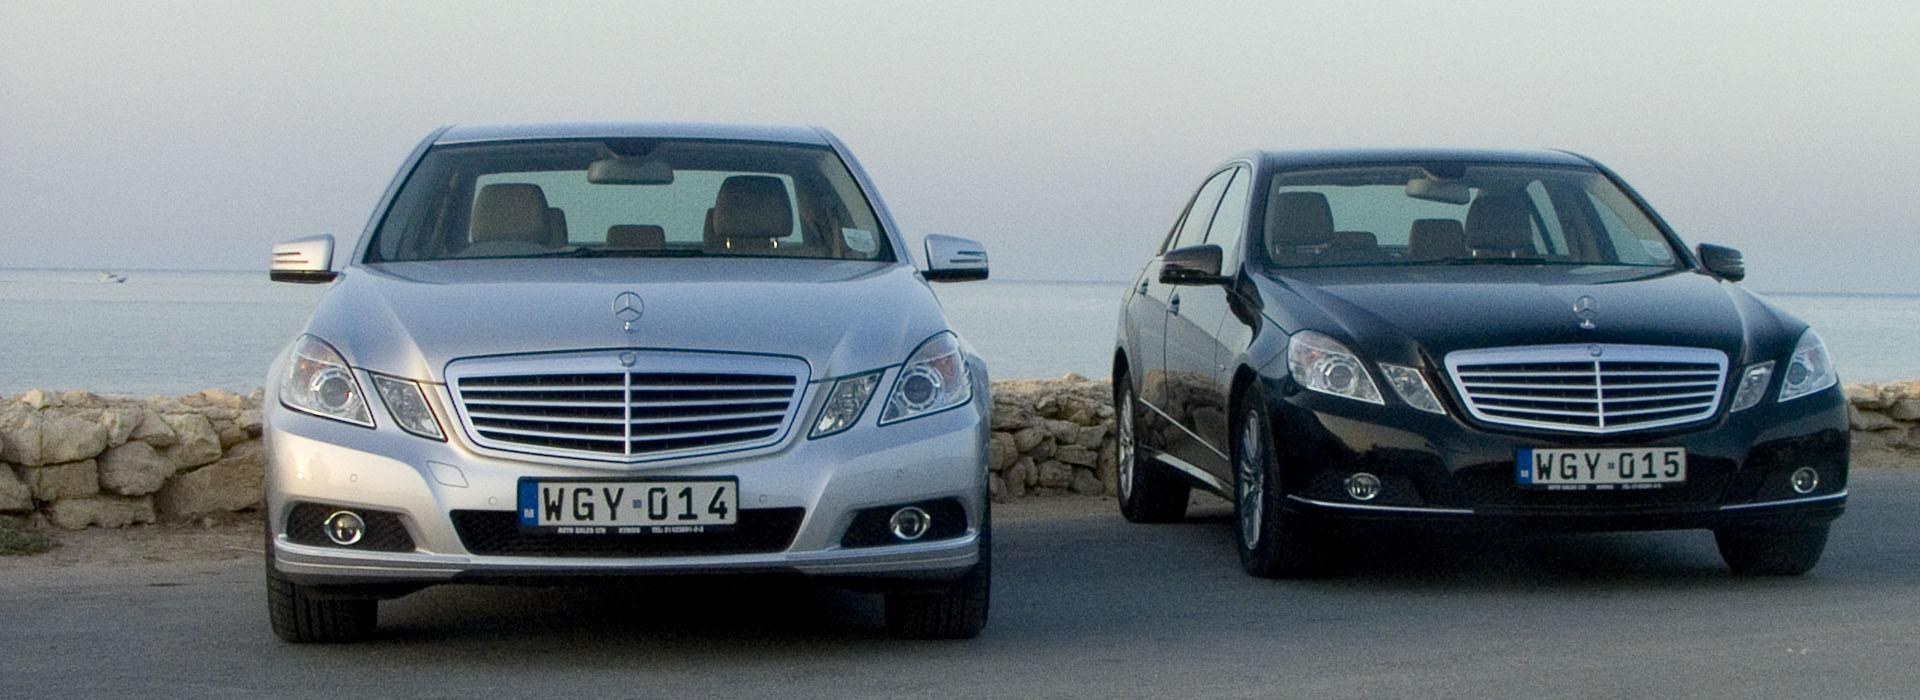 chauffeur-drive-malta-2